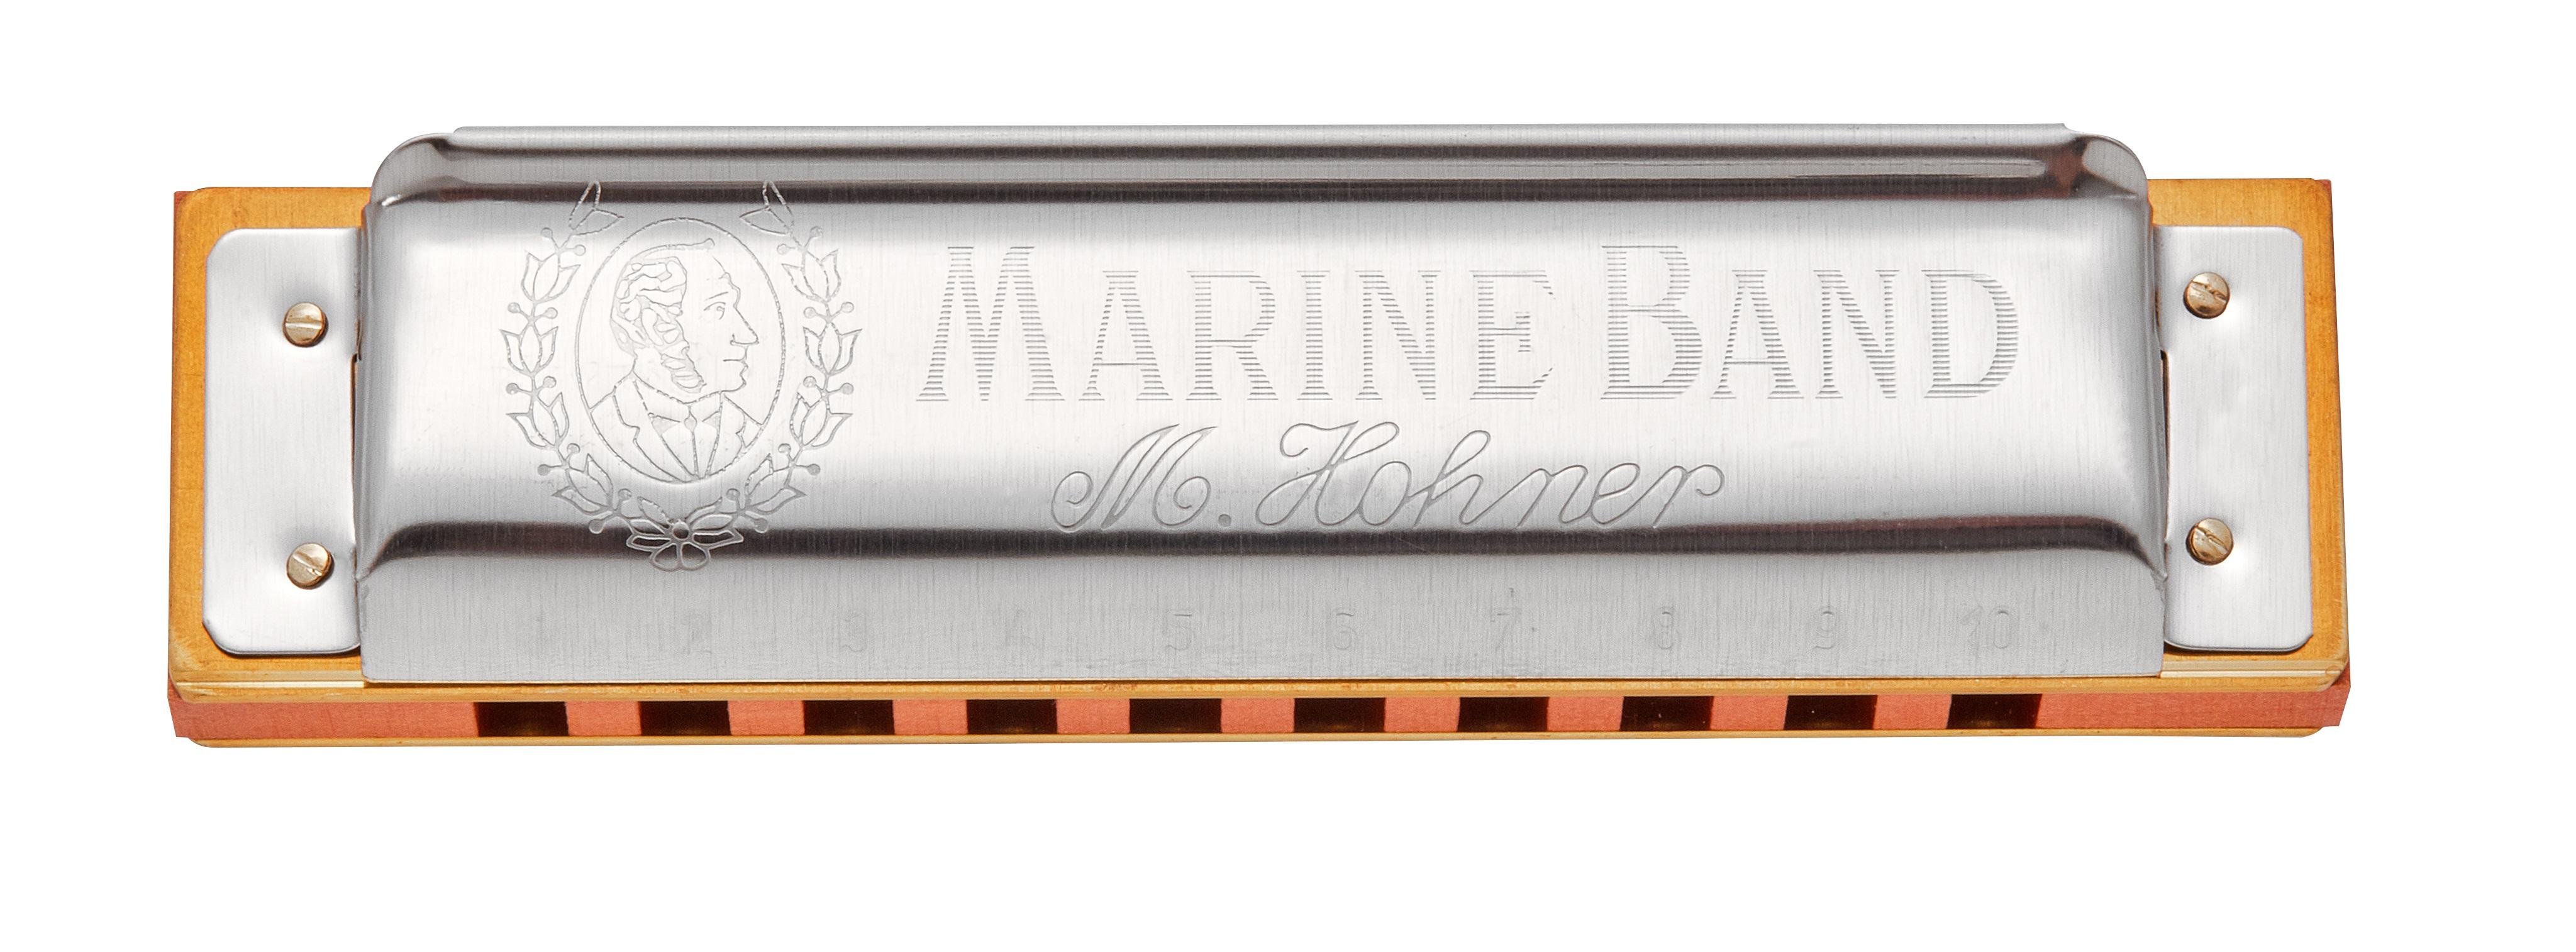 Hohner Marine Band 1896 Eb-natural minor